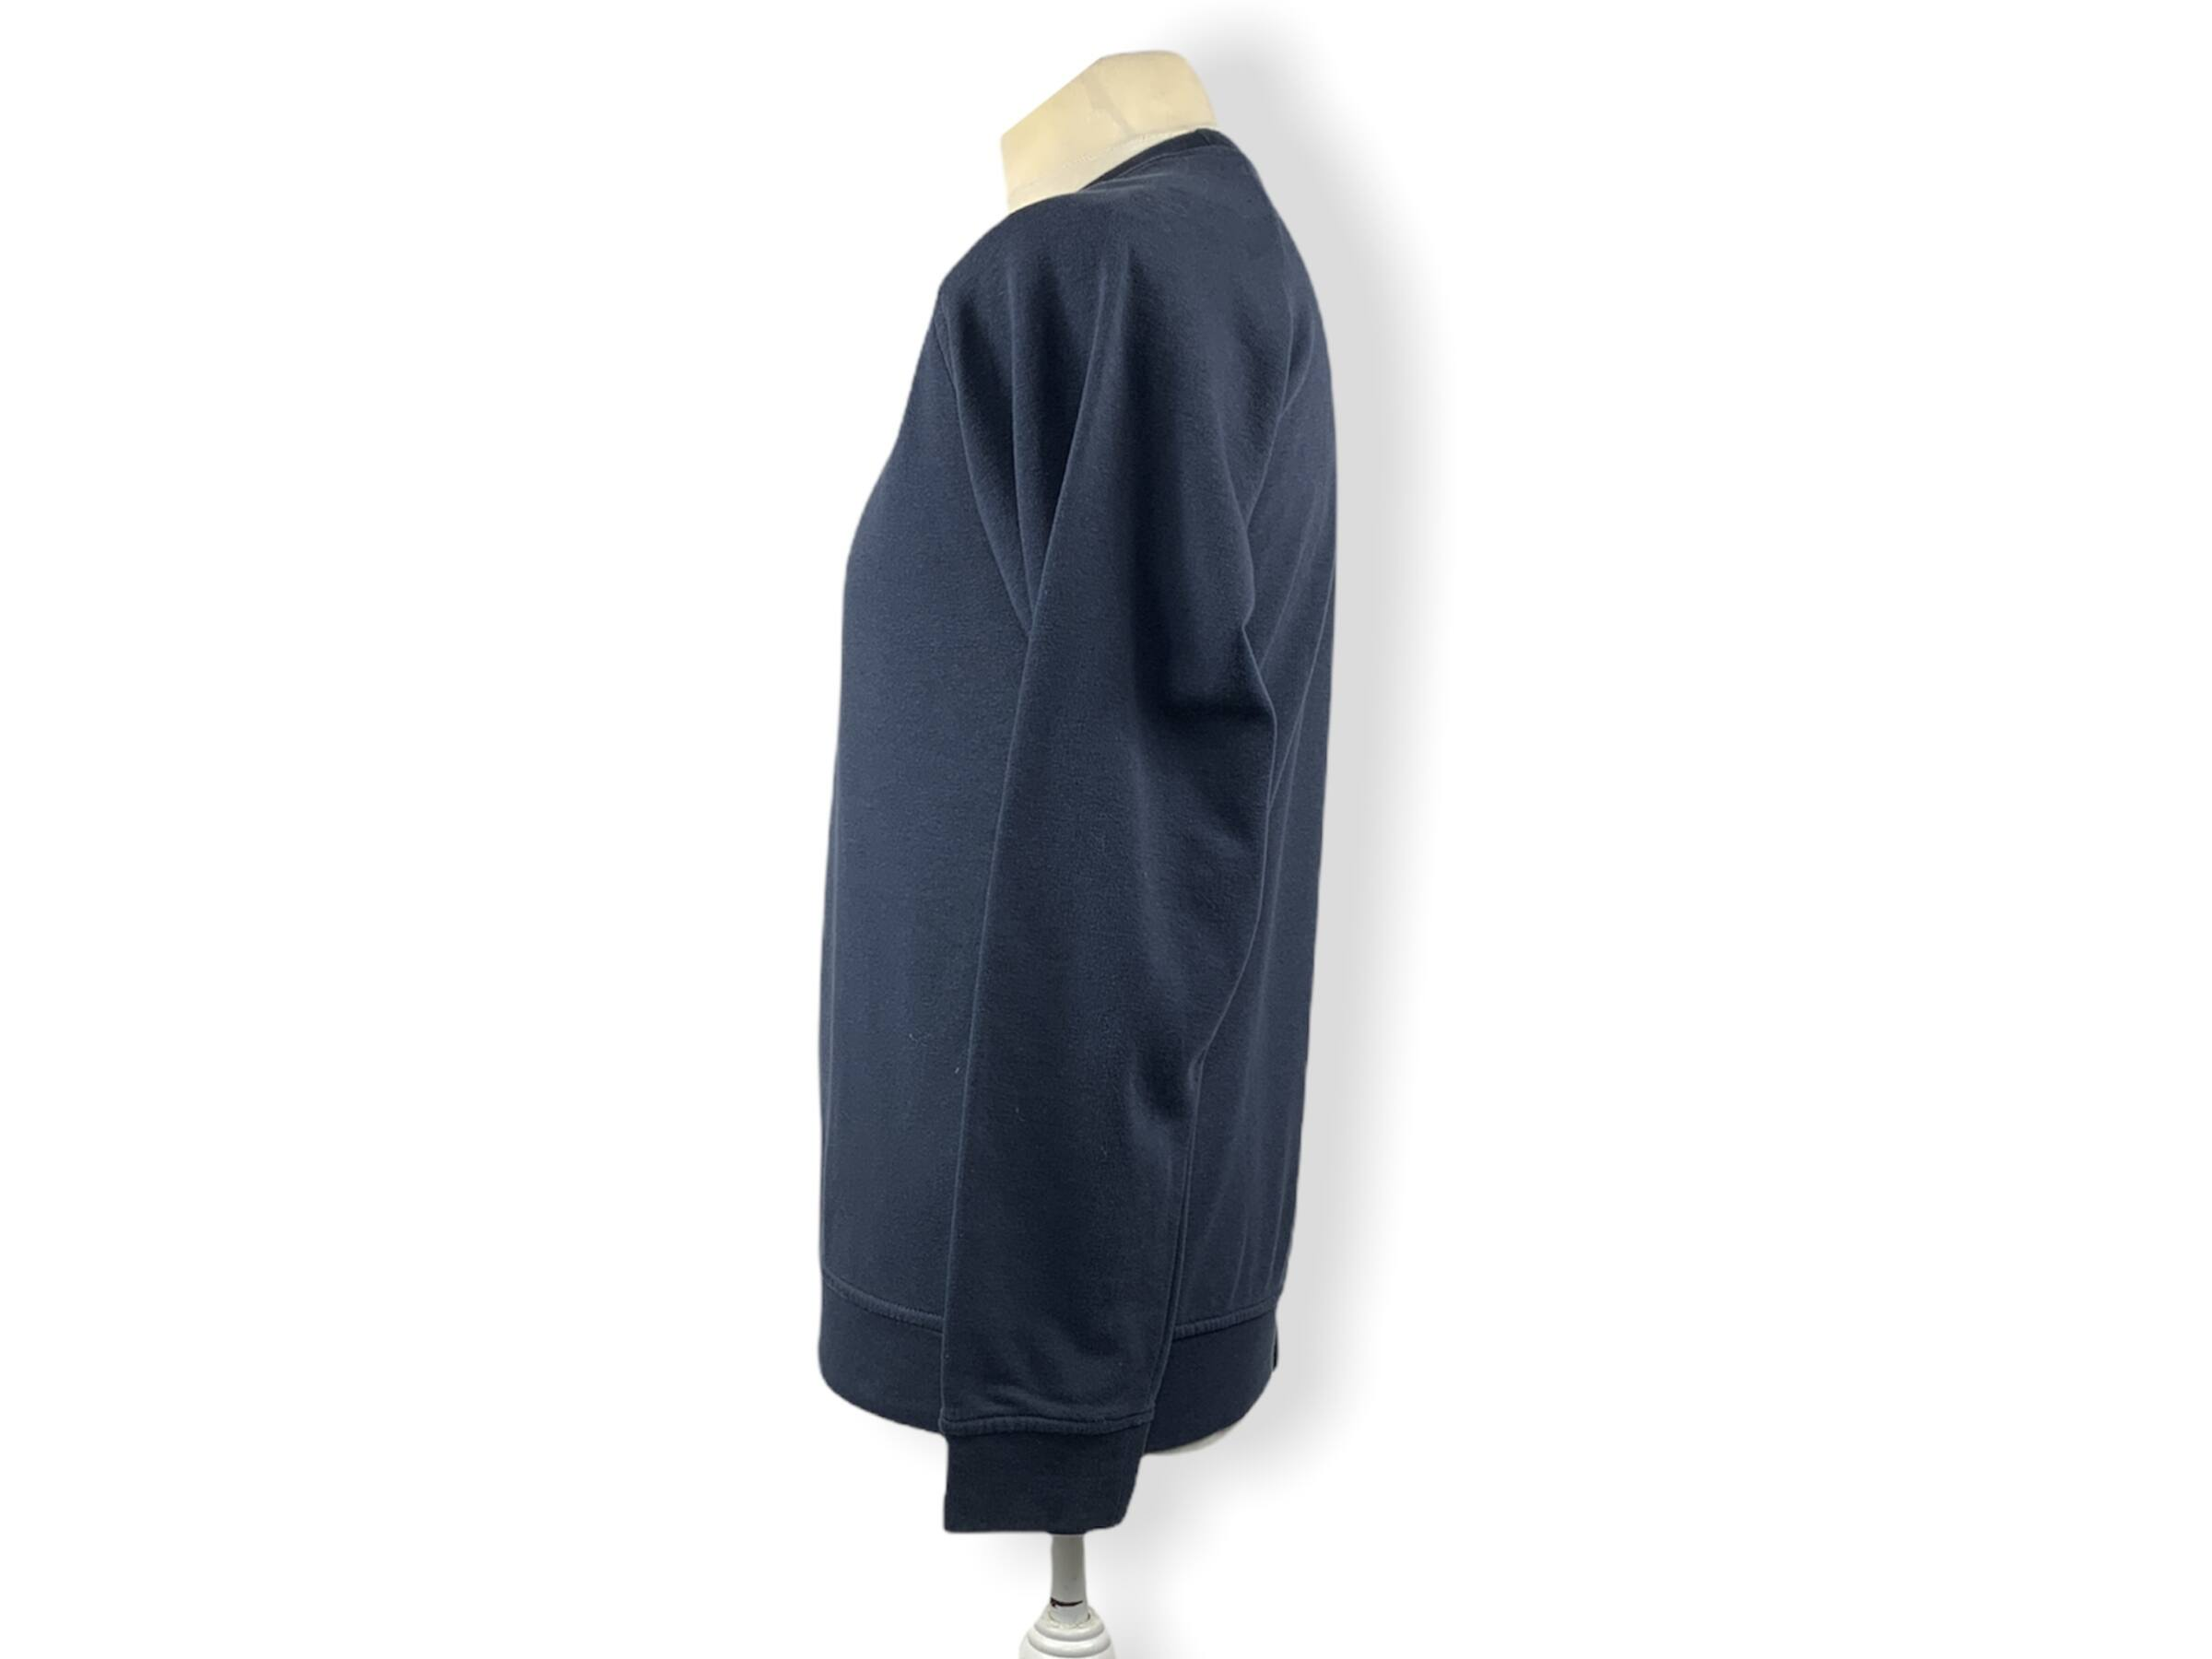 Kappa pulóver (M)